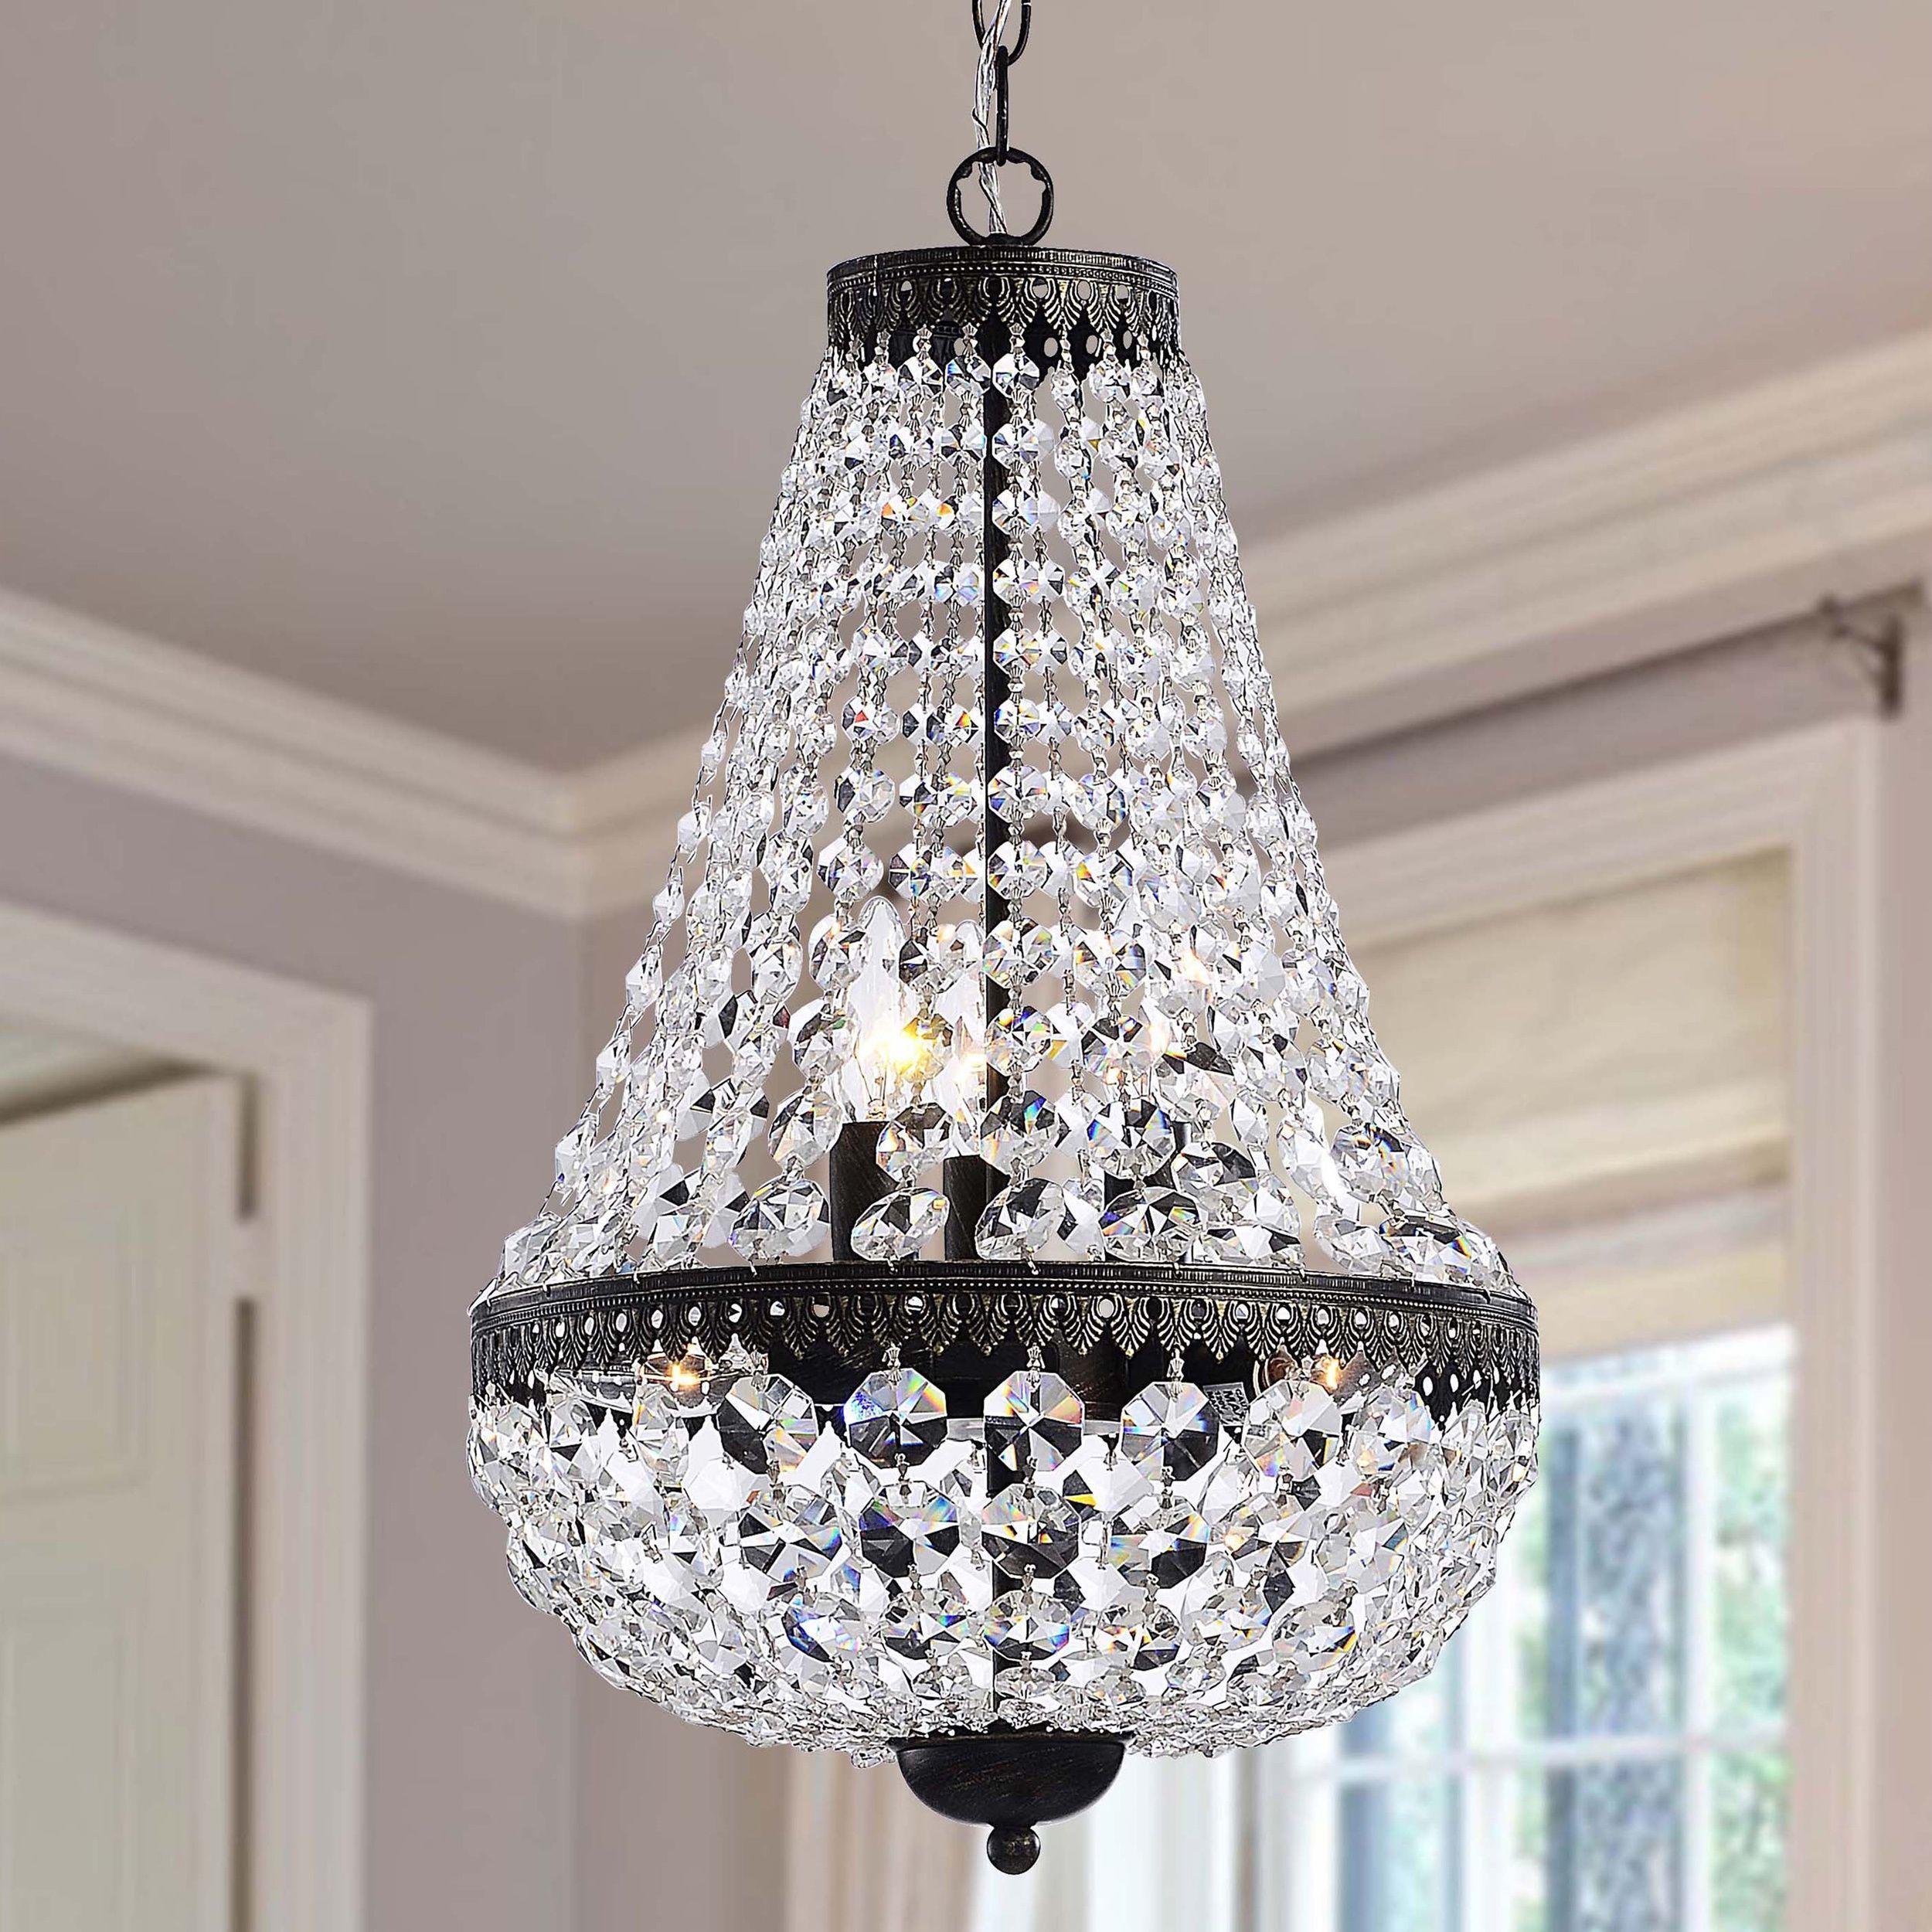 This Symmetric antique crystal chandelier features an antique